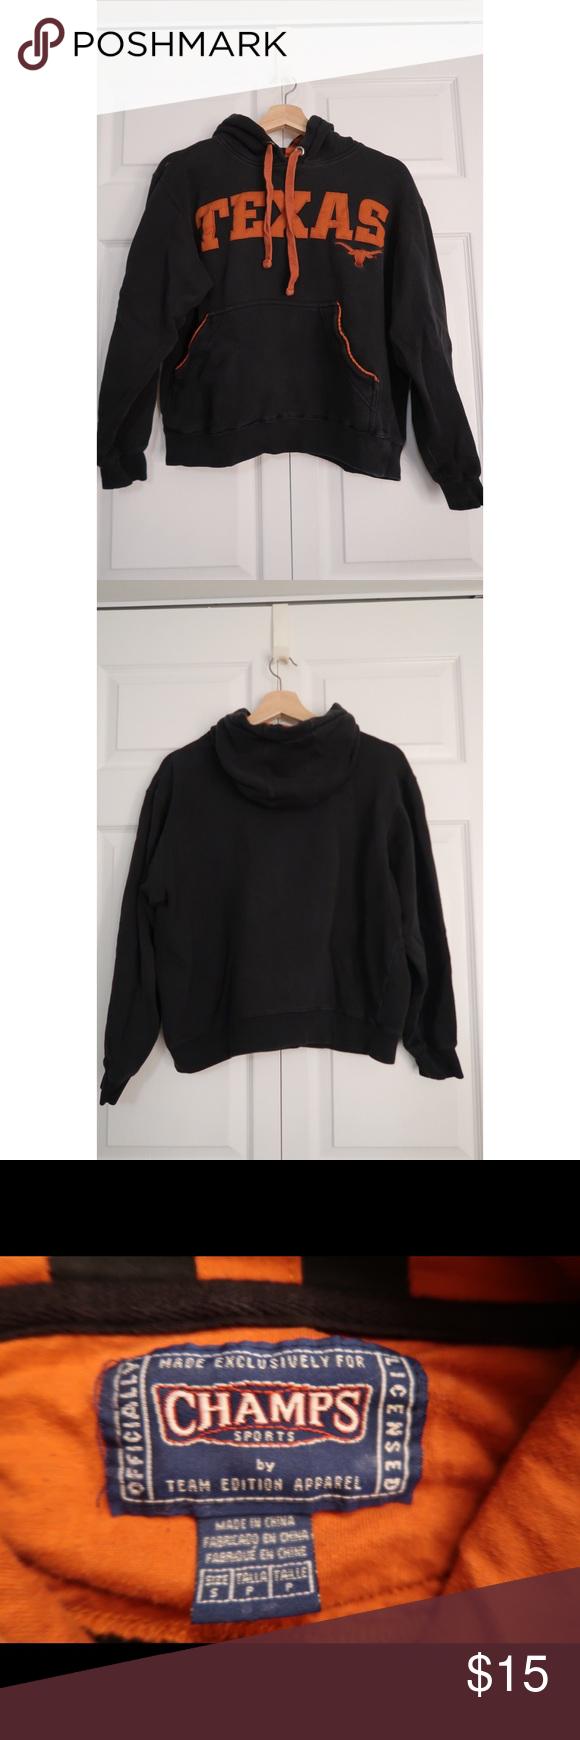 Champs Texas Longhorn Collegiate Sweatshirt Sweatshirts Champion Tops Clothes Design [ 1740 x 580 Pixel ]